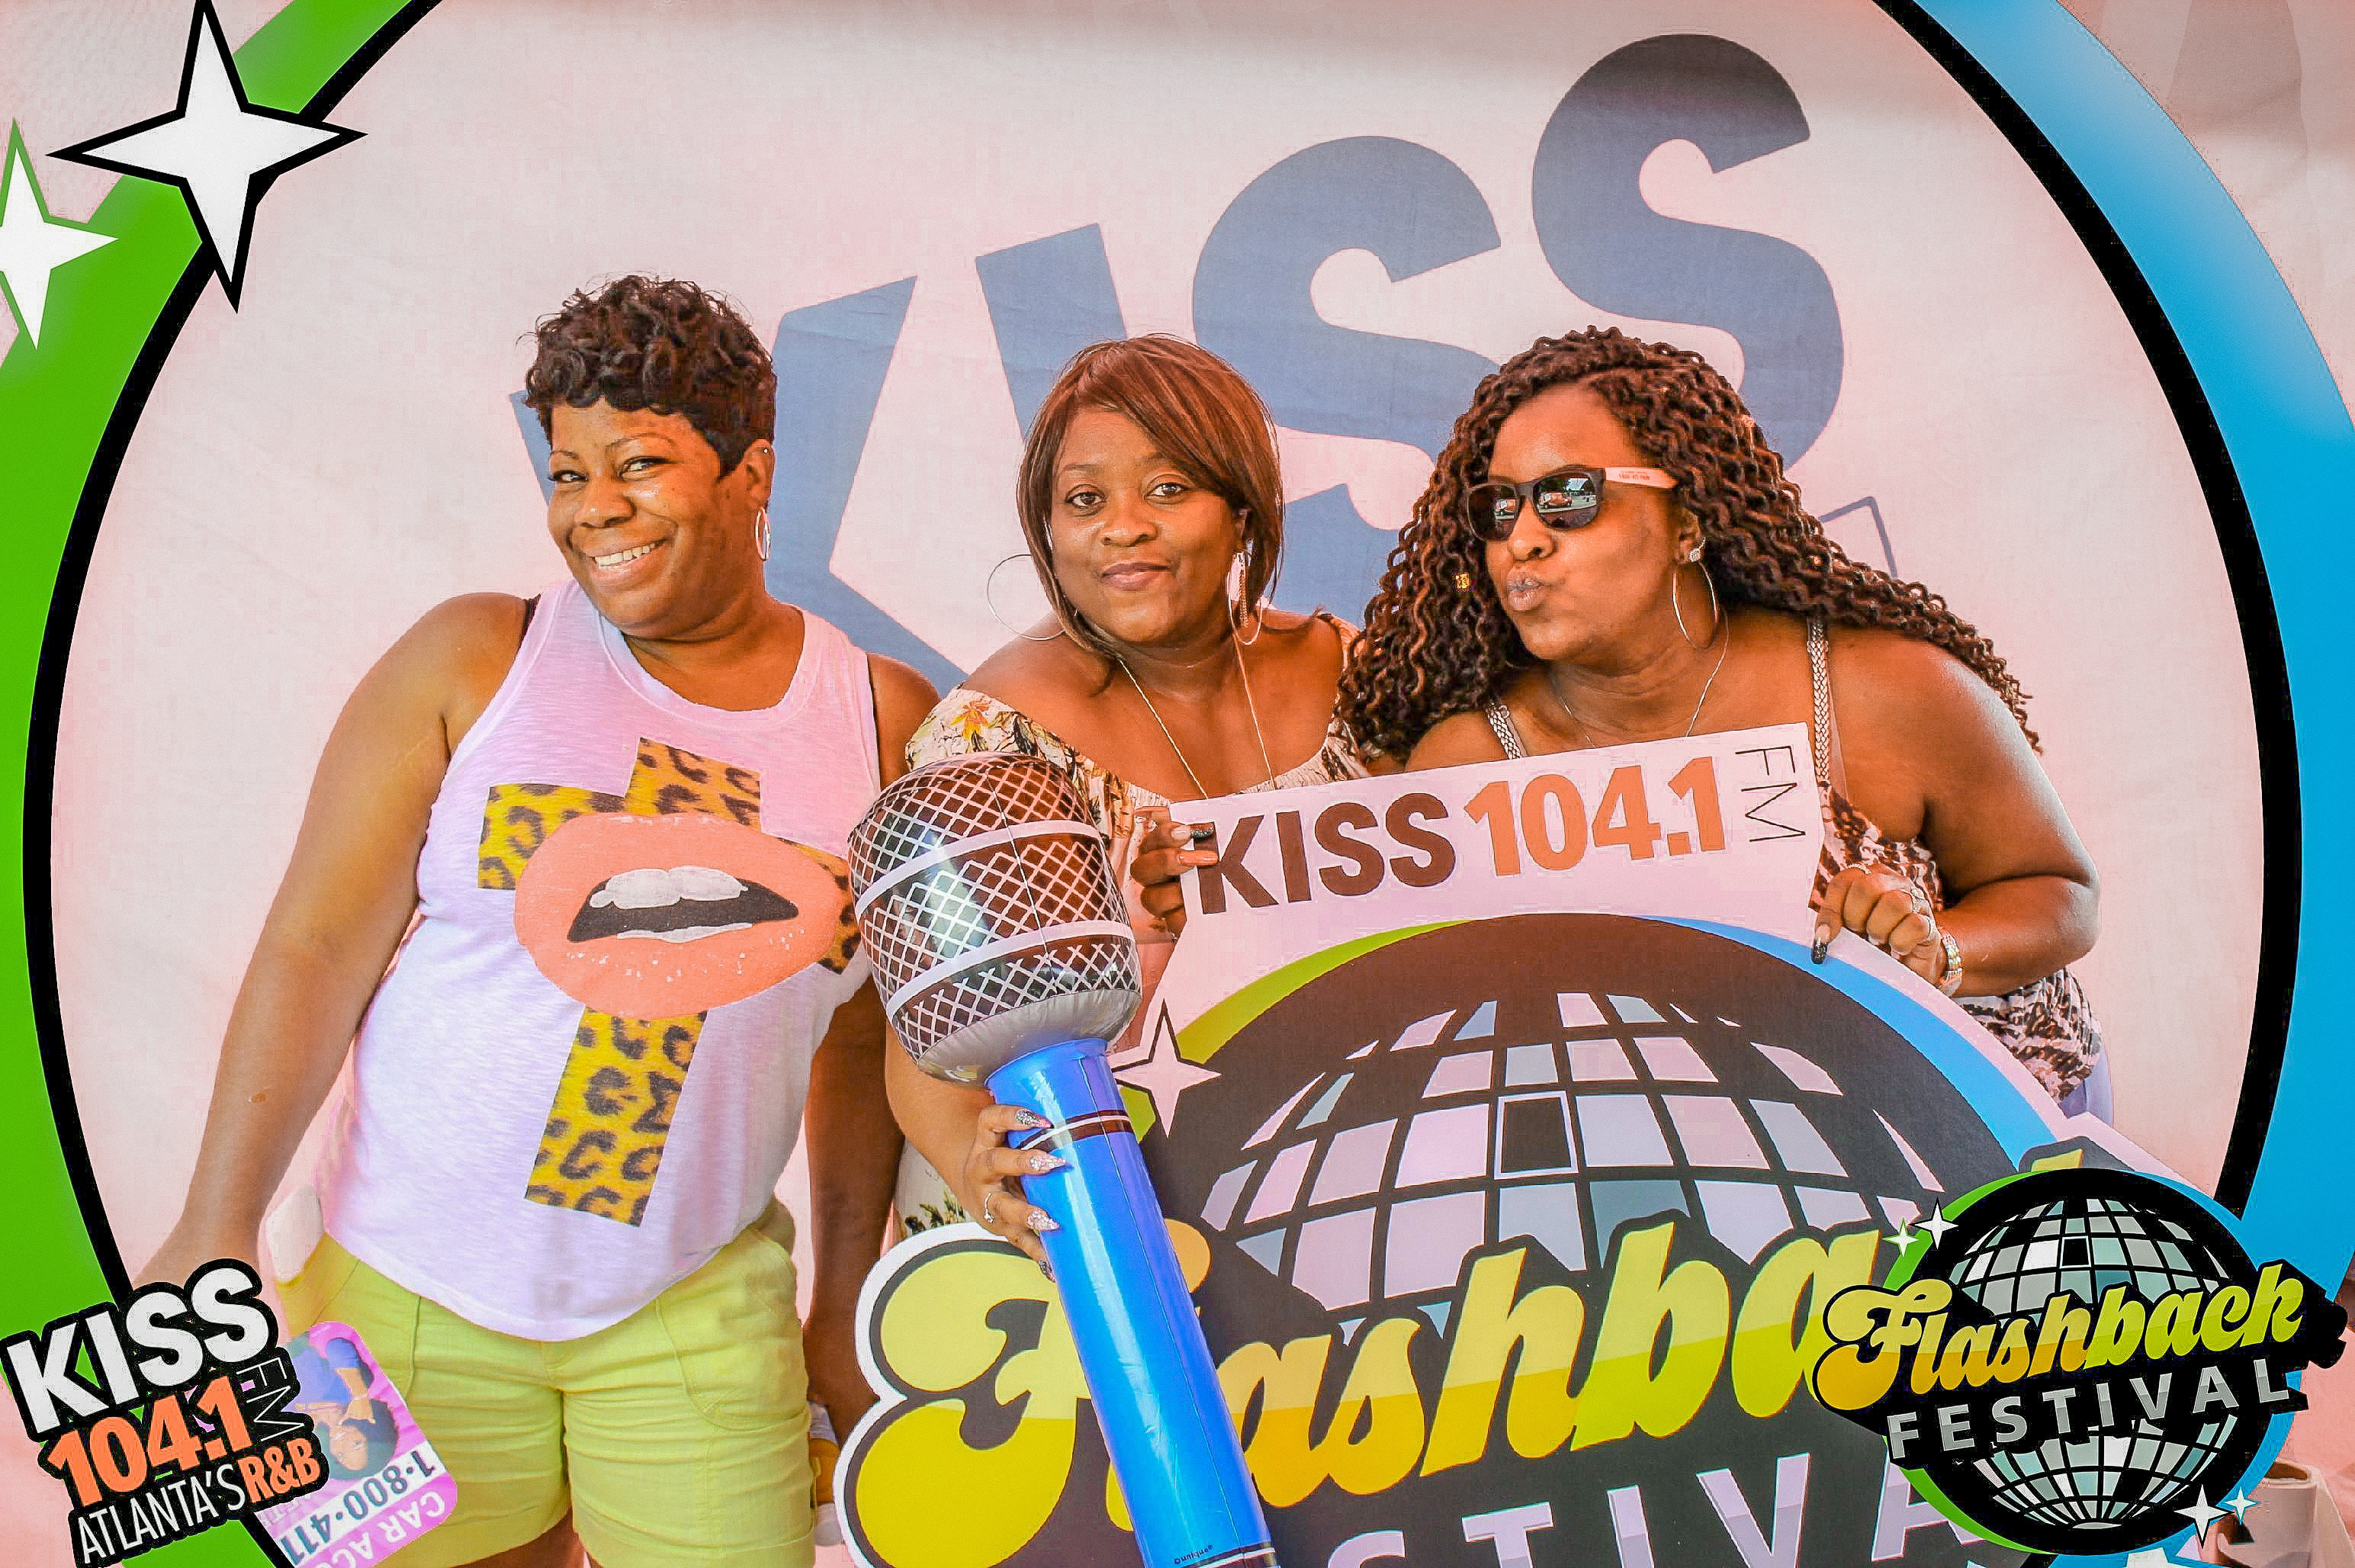 104.1 Radio at Flashback Festival